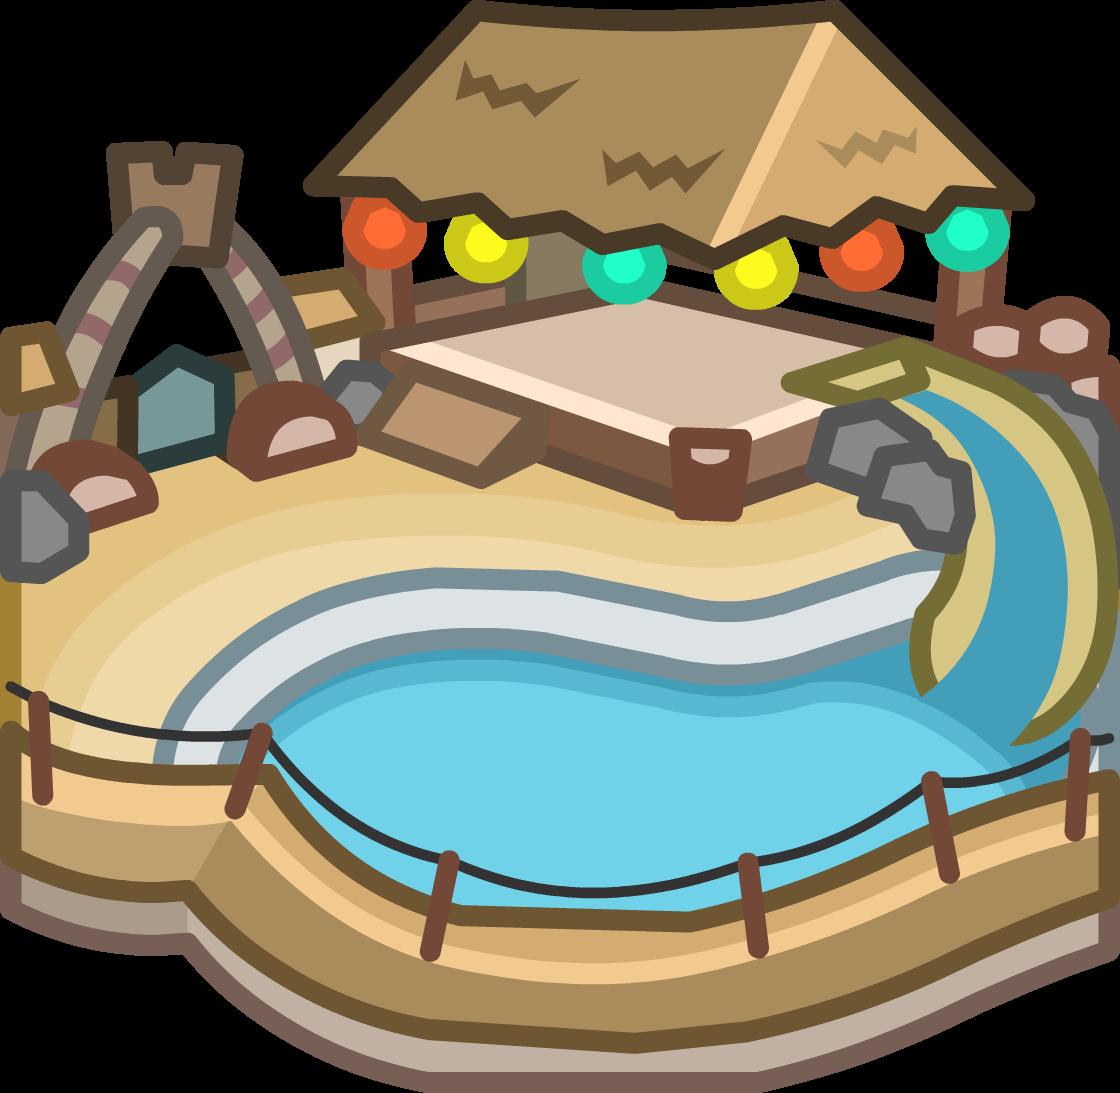 igloo clipart ice house